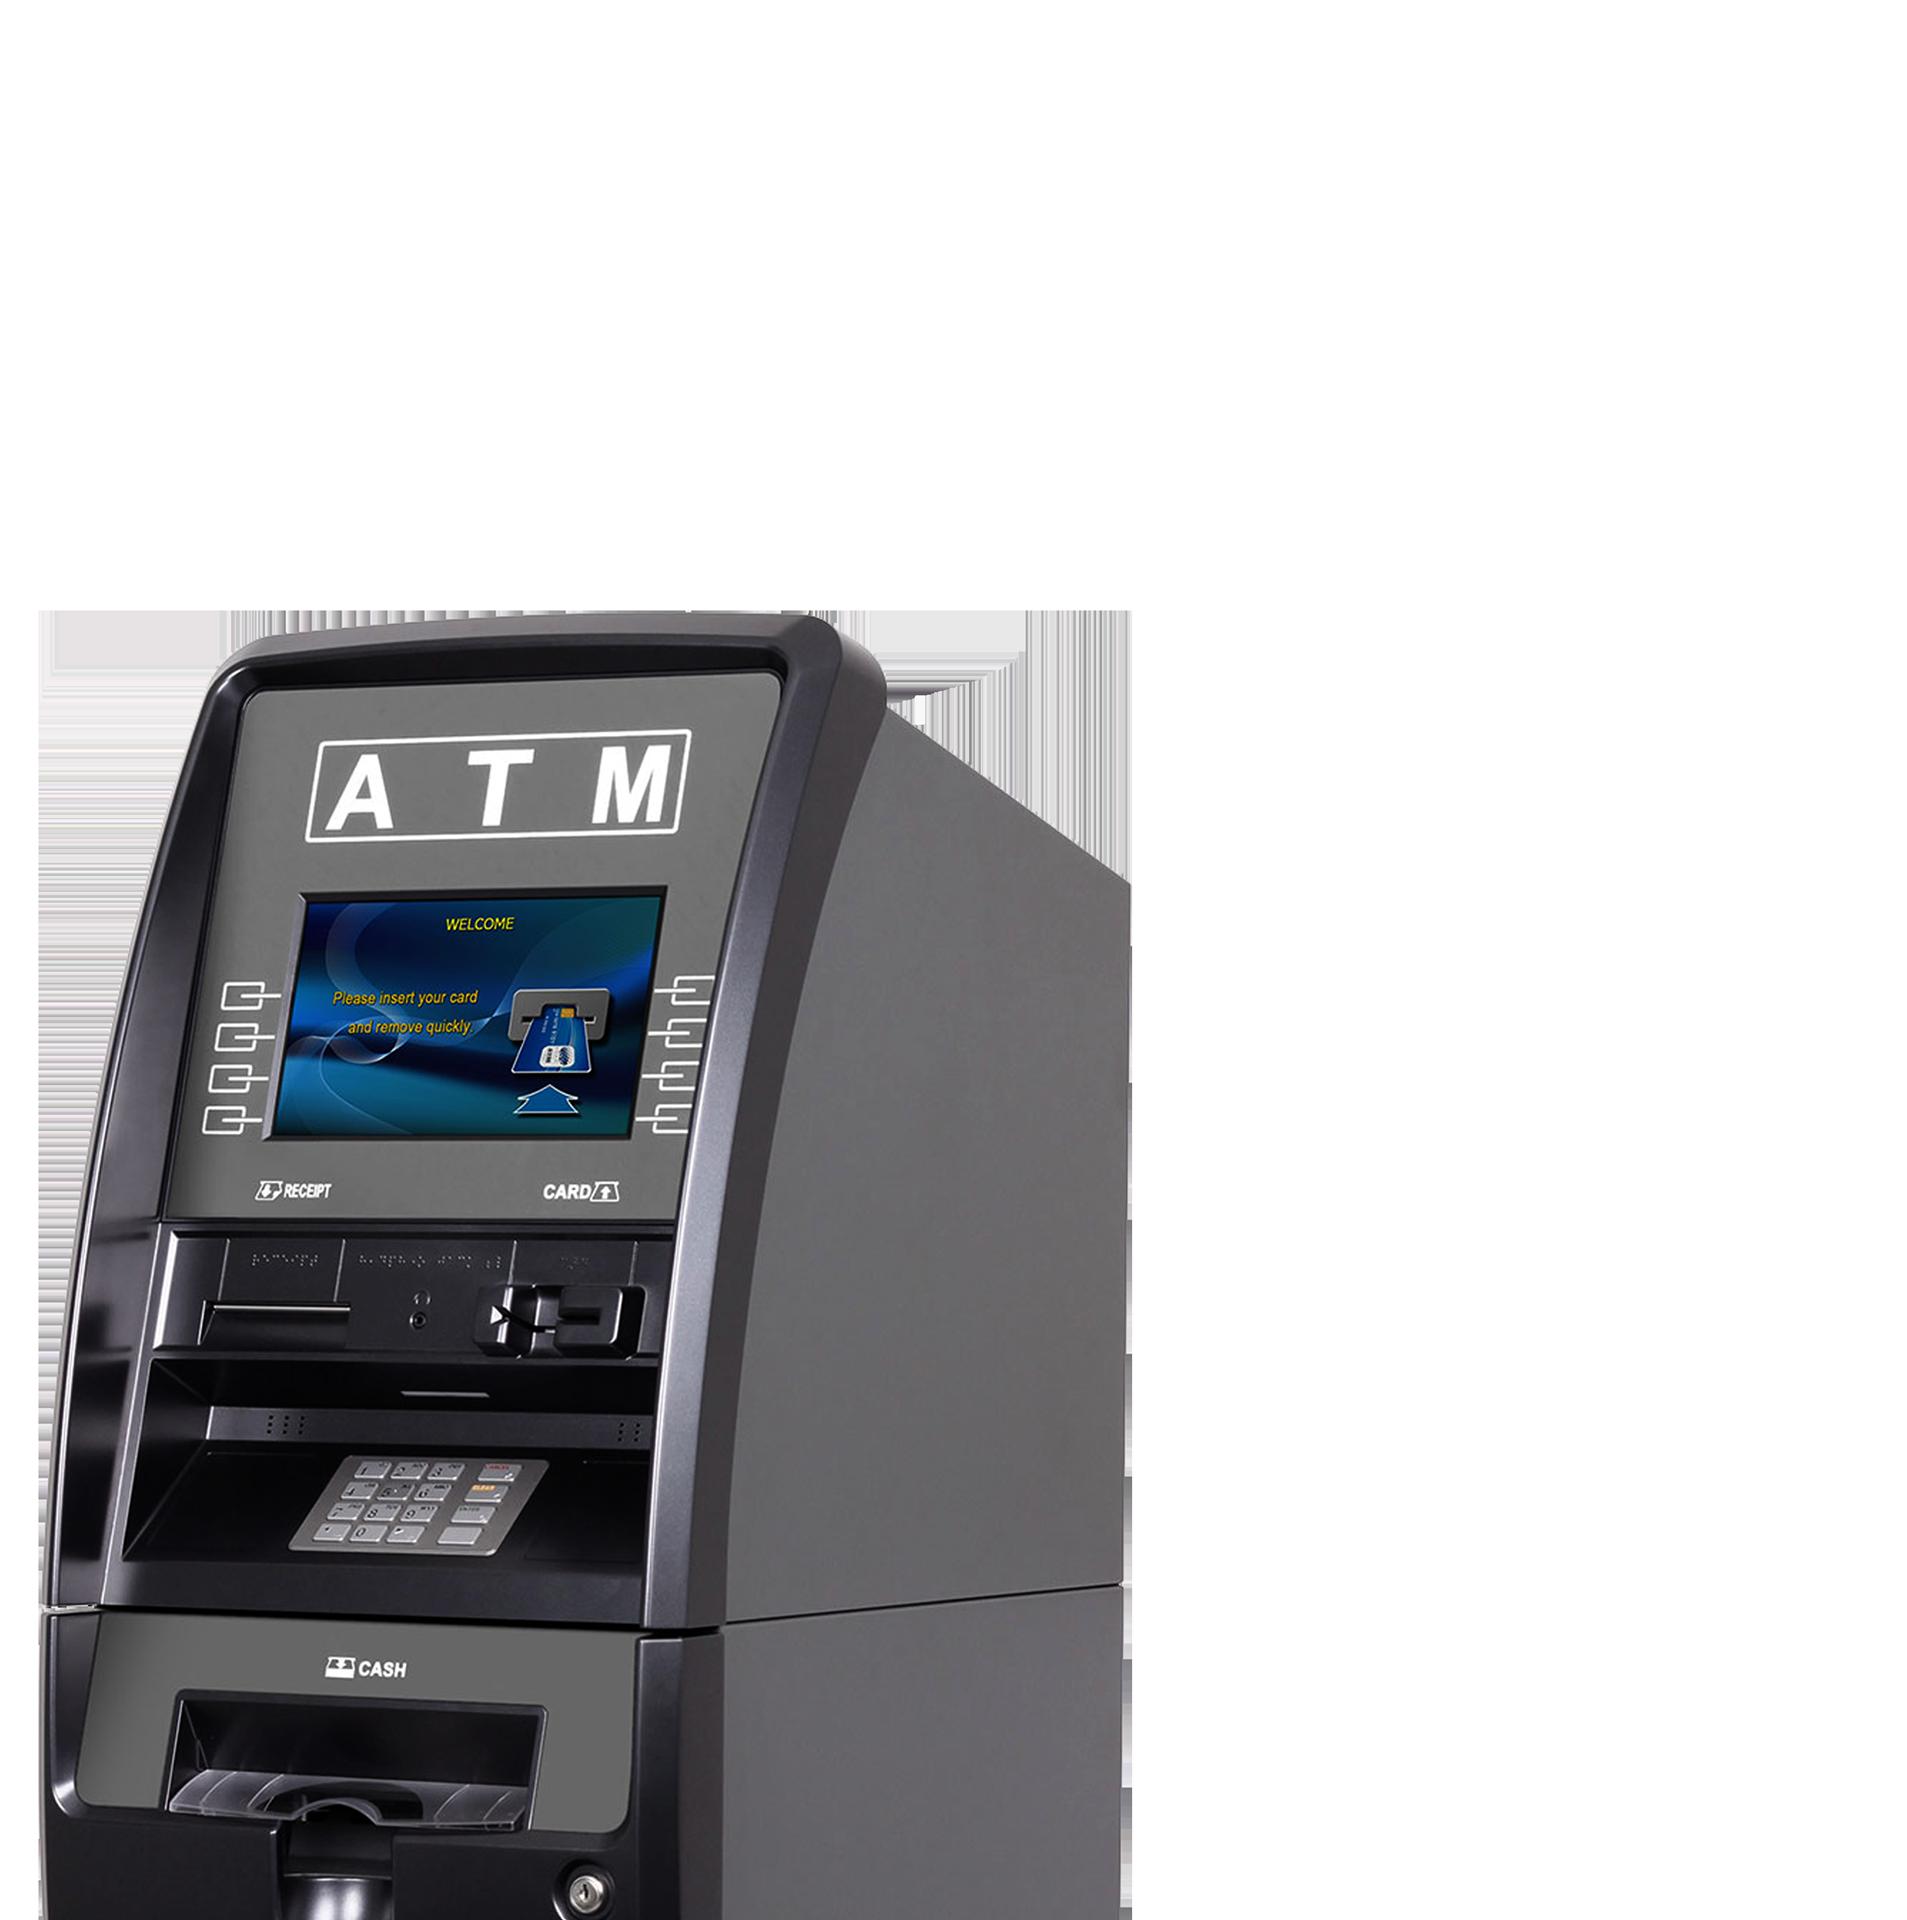 ATM Terminal